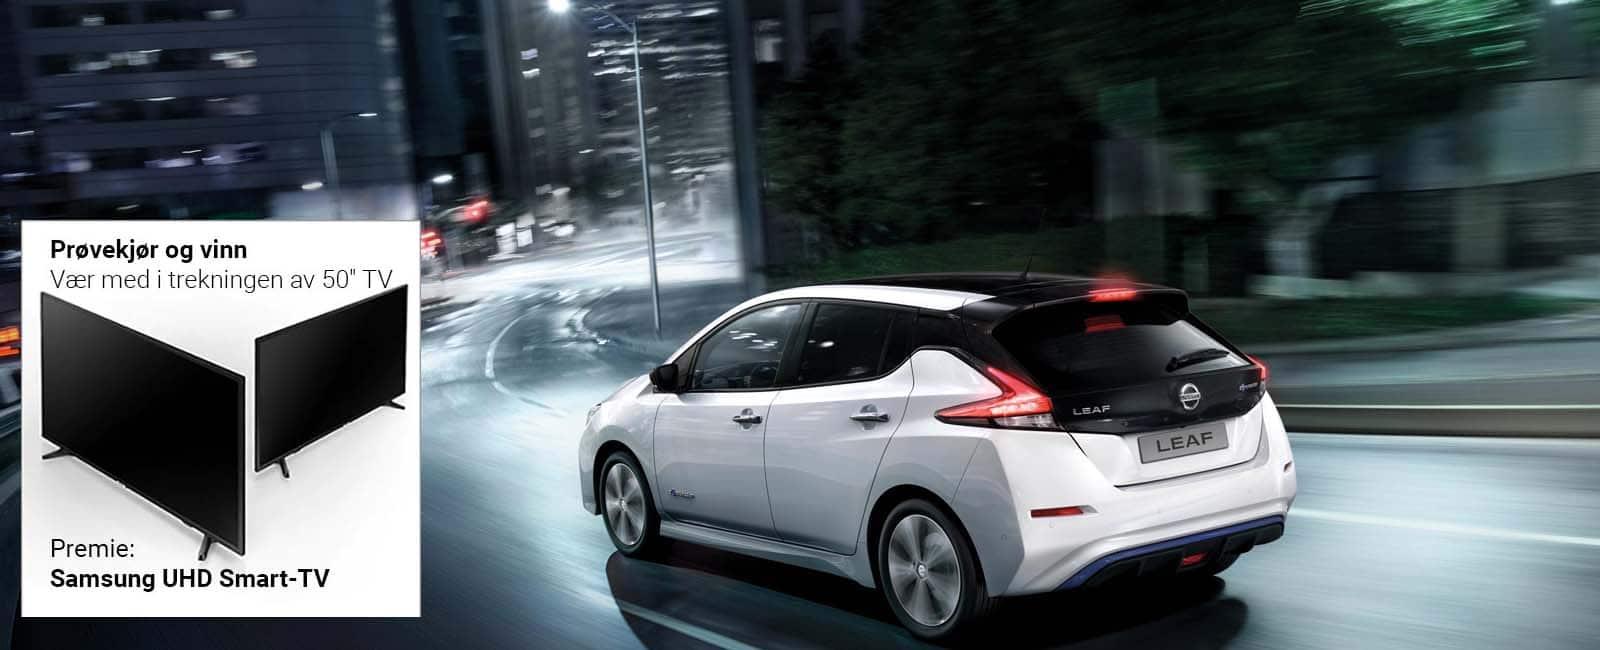 Nissan LEAF - Vinn TV venstre